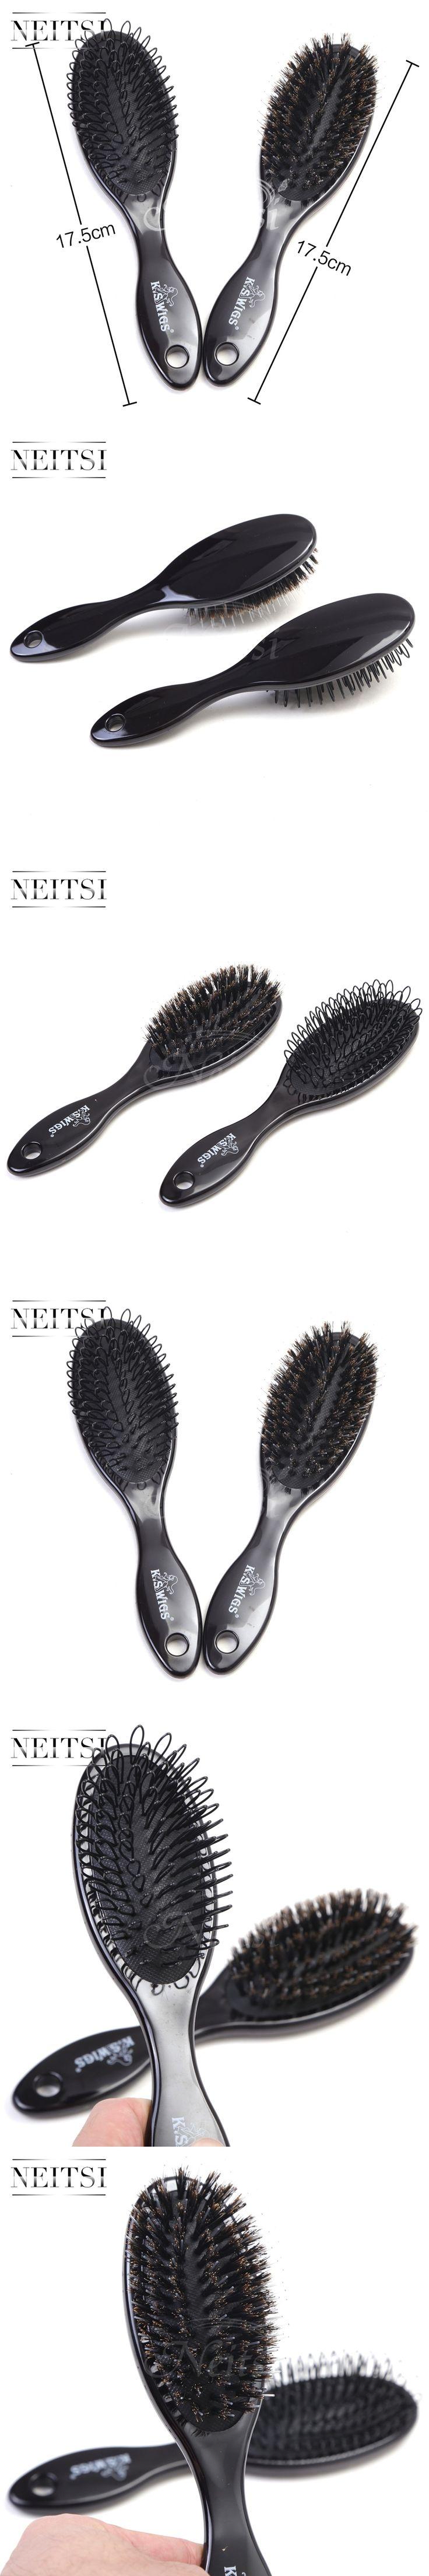 Neitsi Professional 1PC Boar Bristle Hair Brush & 1PC Plastic Hair Brush For Human Hair Extensions 2PCS/Set